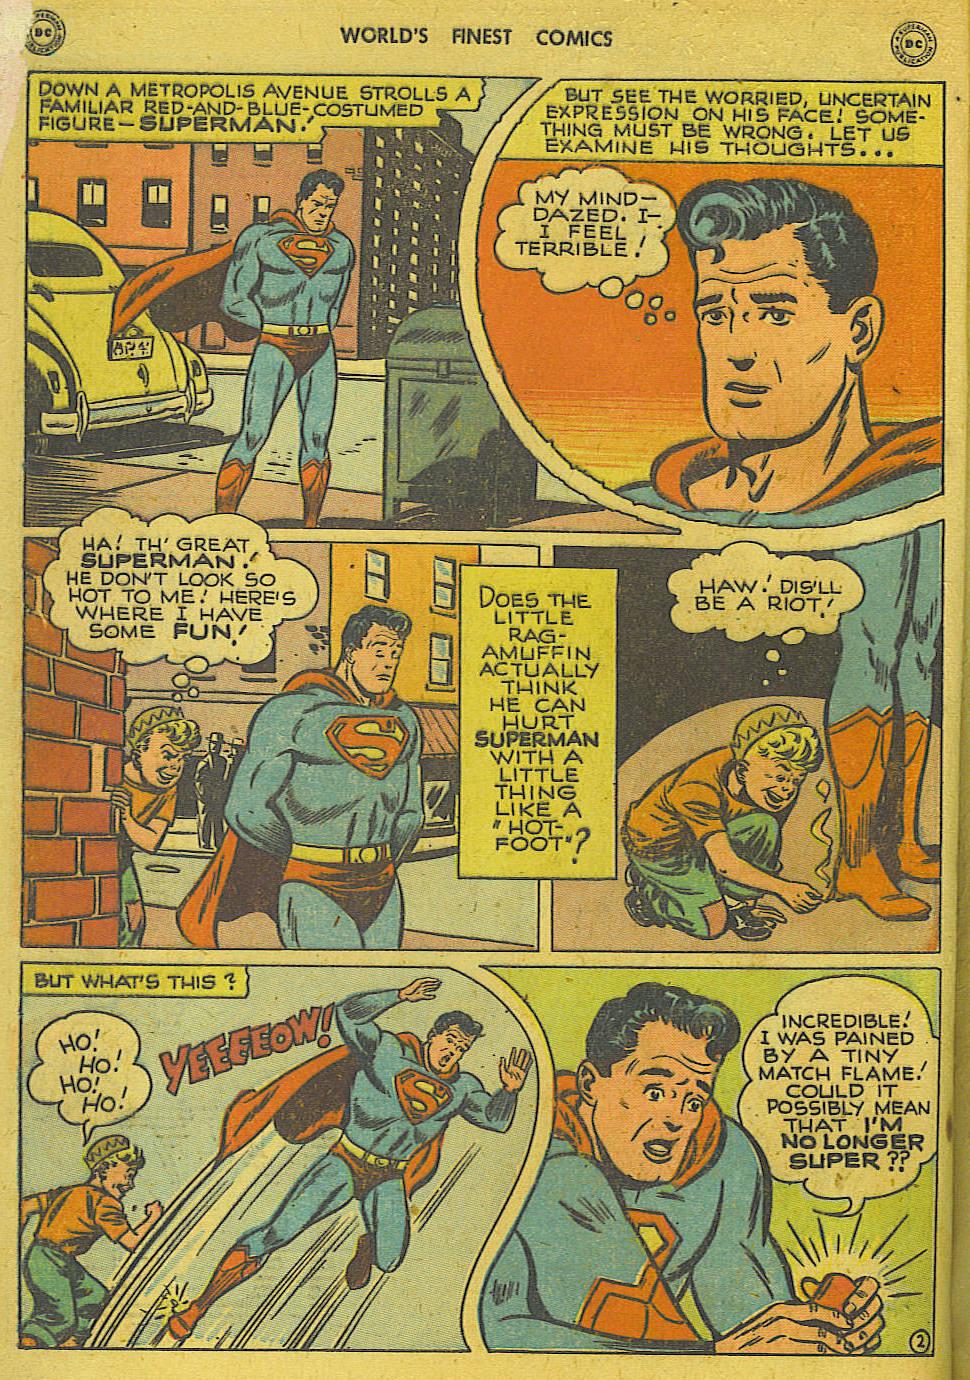 Read online World's Finest Comics comic -  Issue #34 - 4